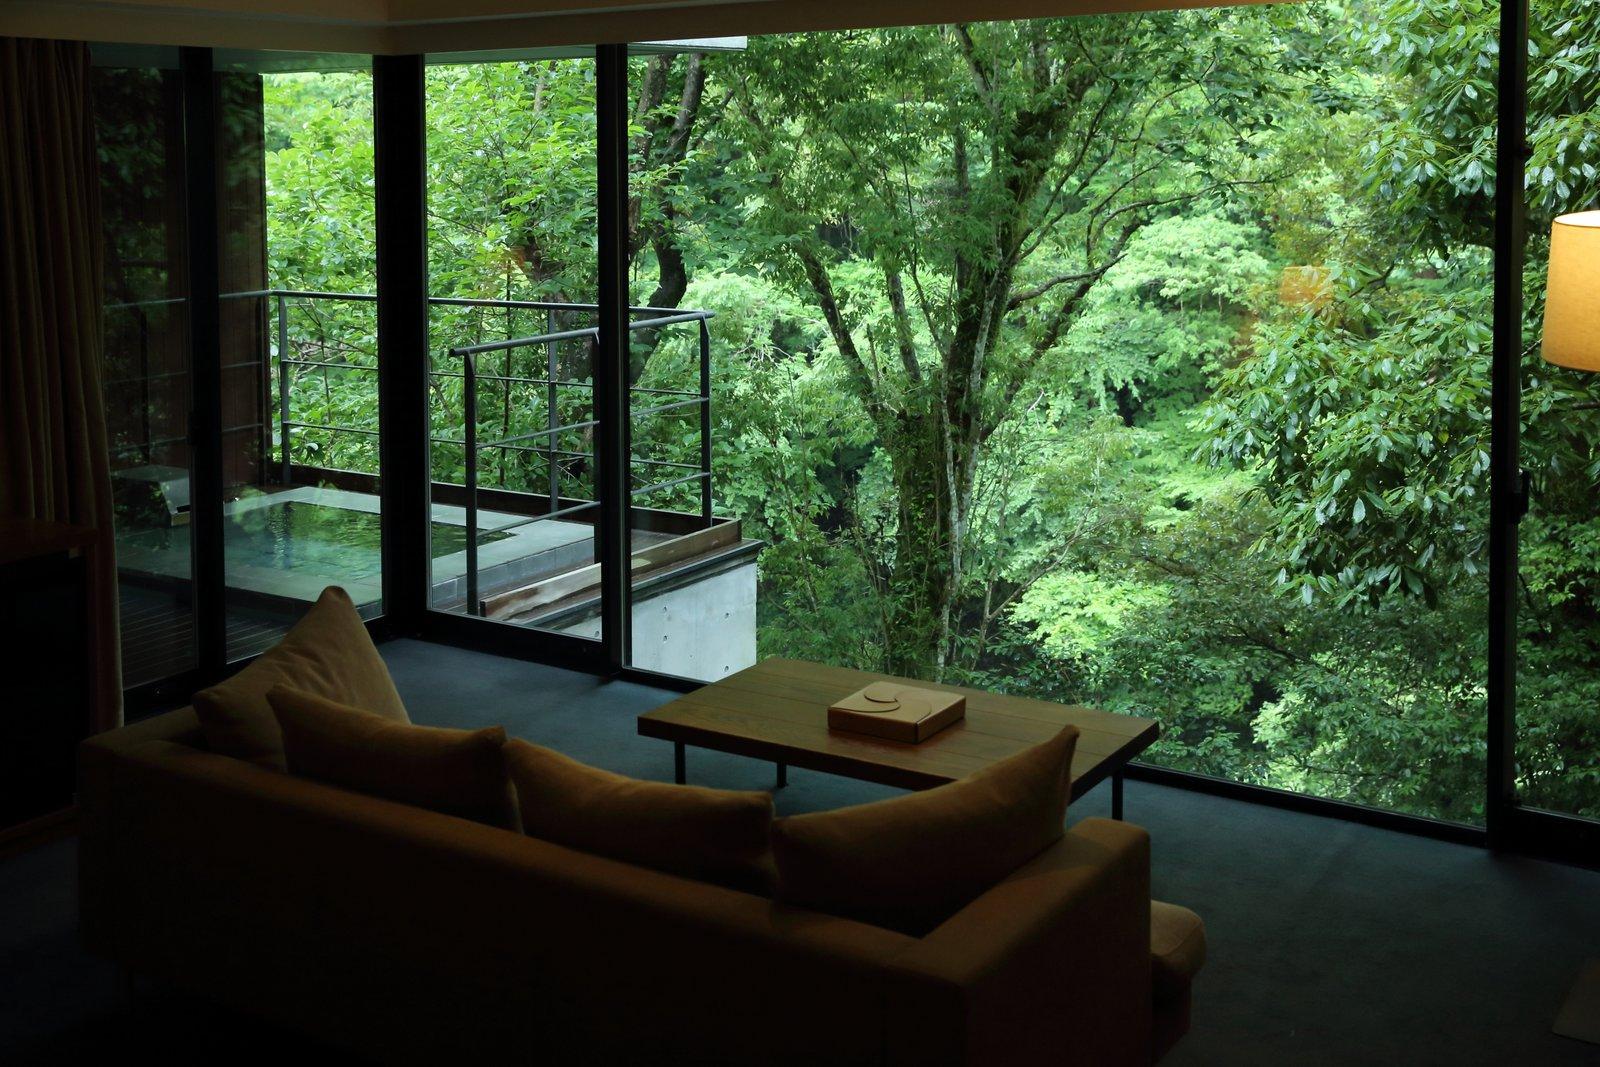 Living Room, Sofa, Coffee Tables, Carpet Floor, and Floor Lighting  Arcana Izu